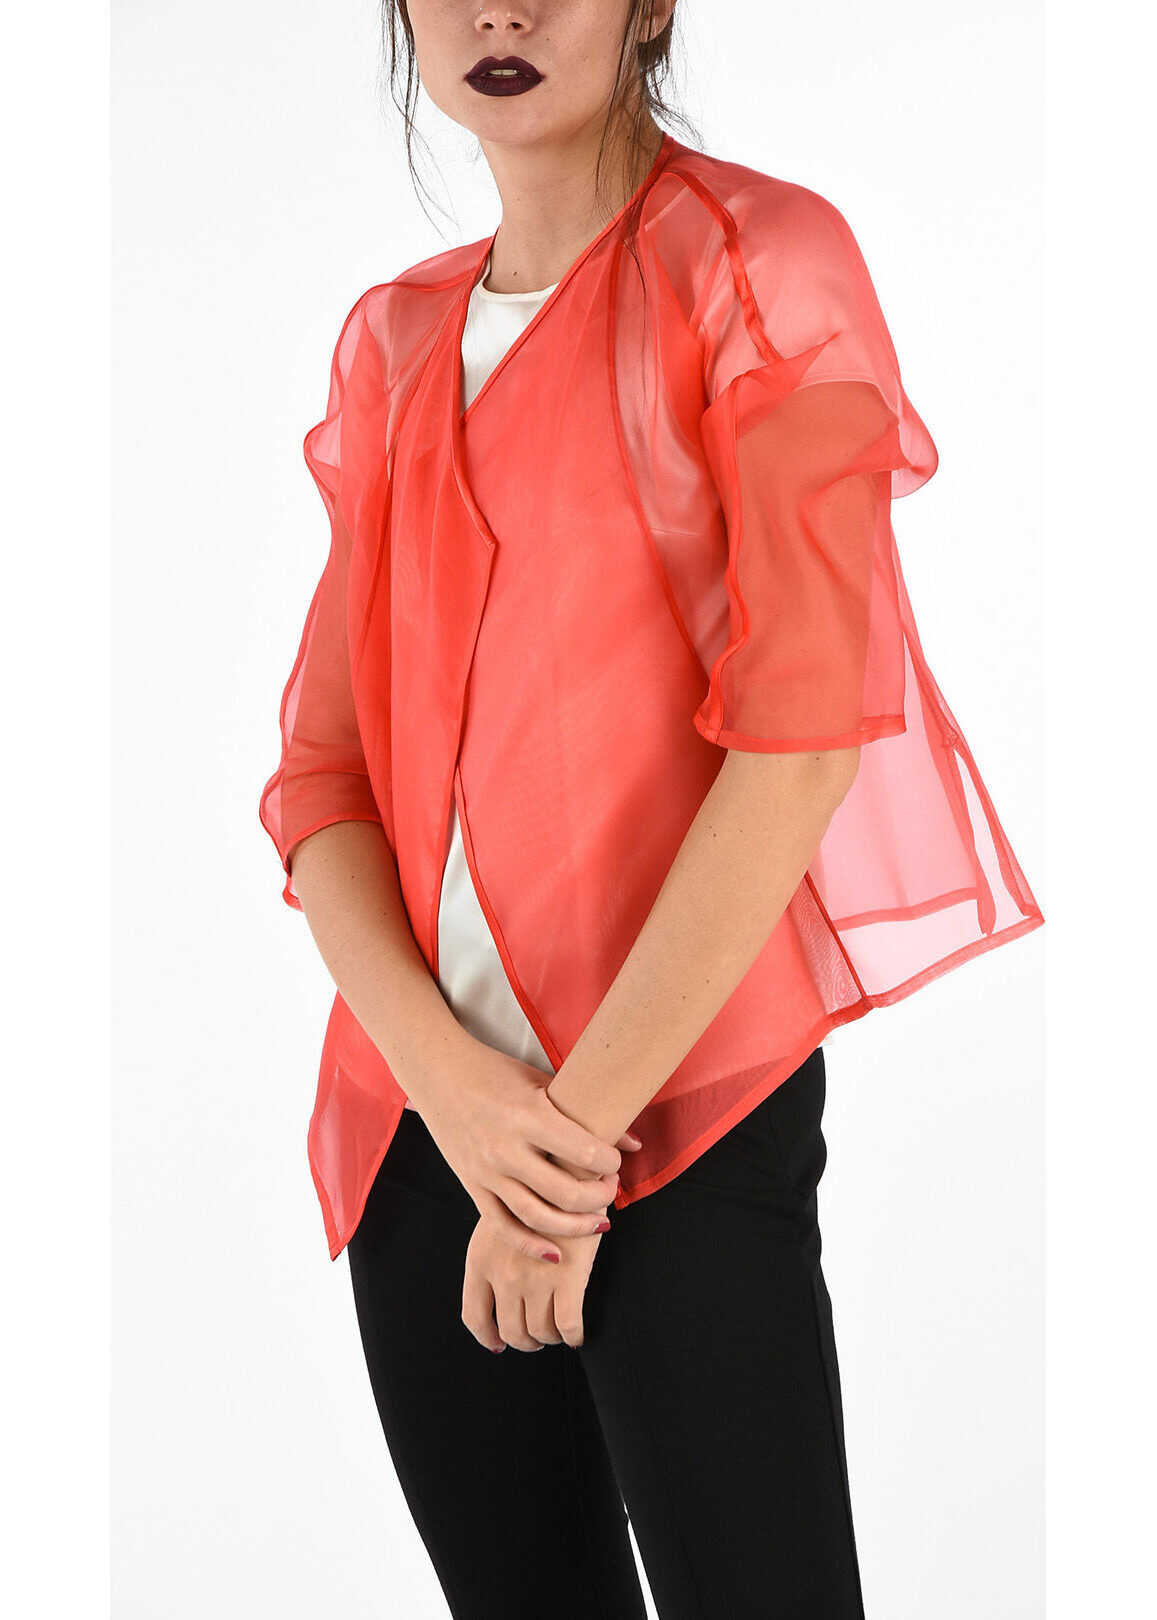 Armani COLLEZIONI Silk Blouse Jacket PINK